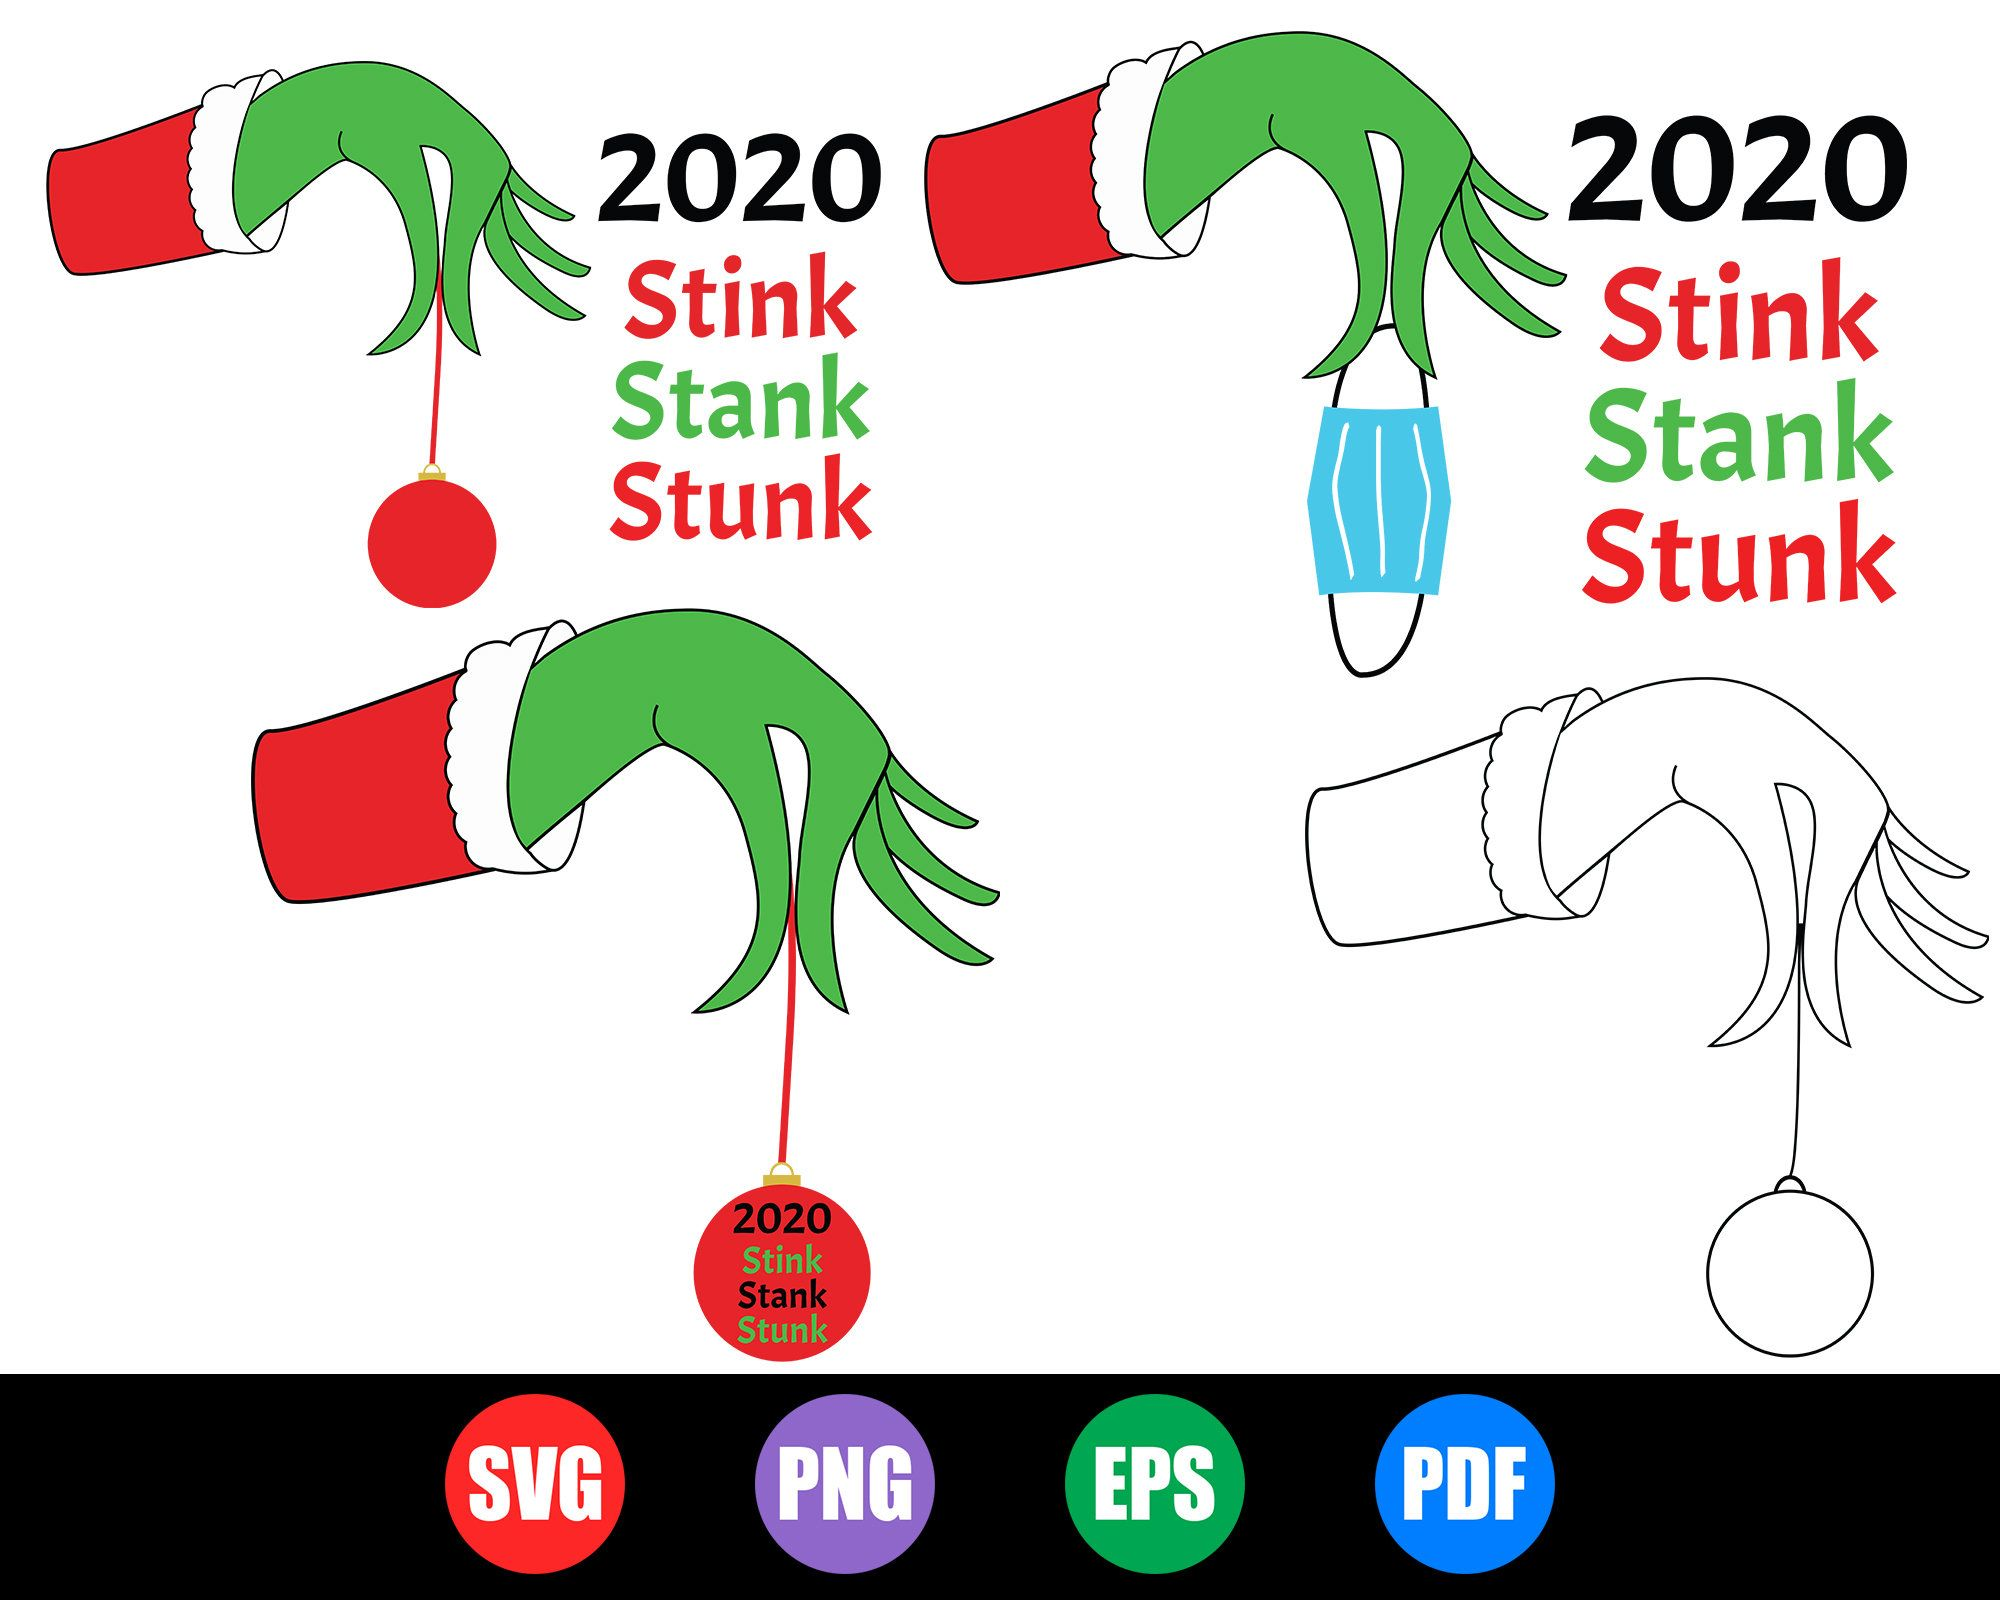 Stink Stank Stunk Svg 2020 Stink Stank Stunk Svg Christmas Etsy In 2020 Stink Stank Stunk Svg Christmas Svg